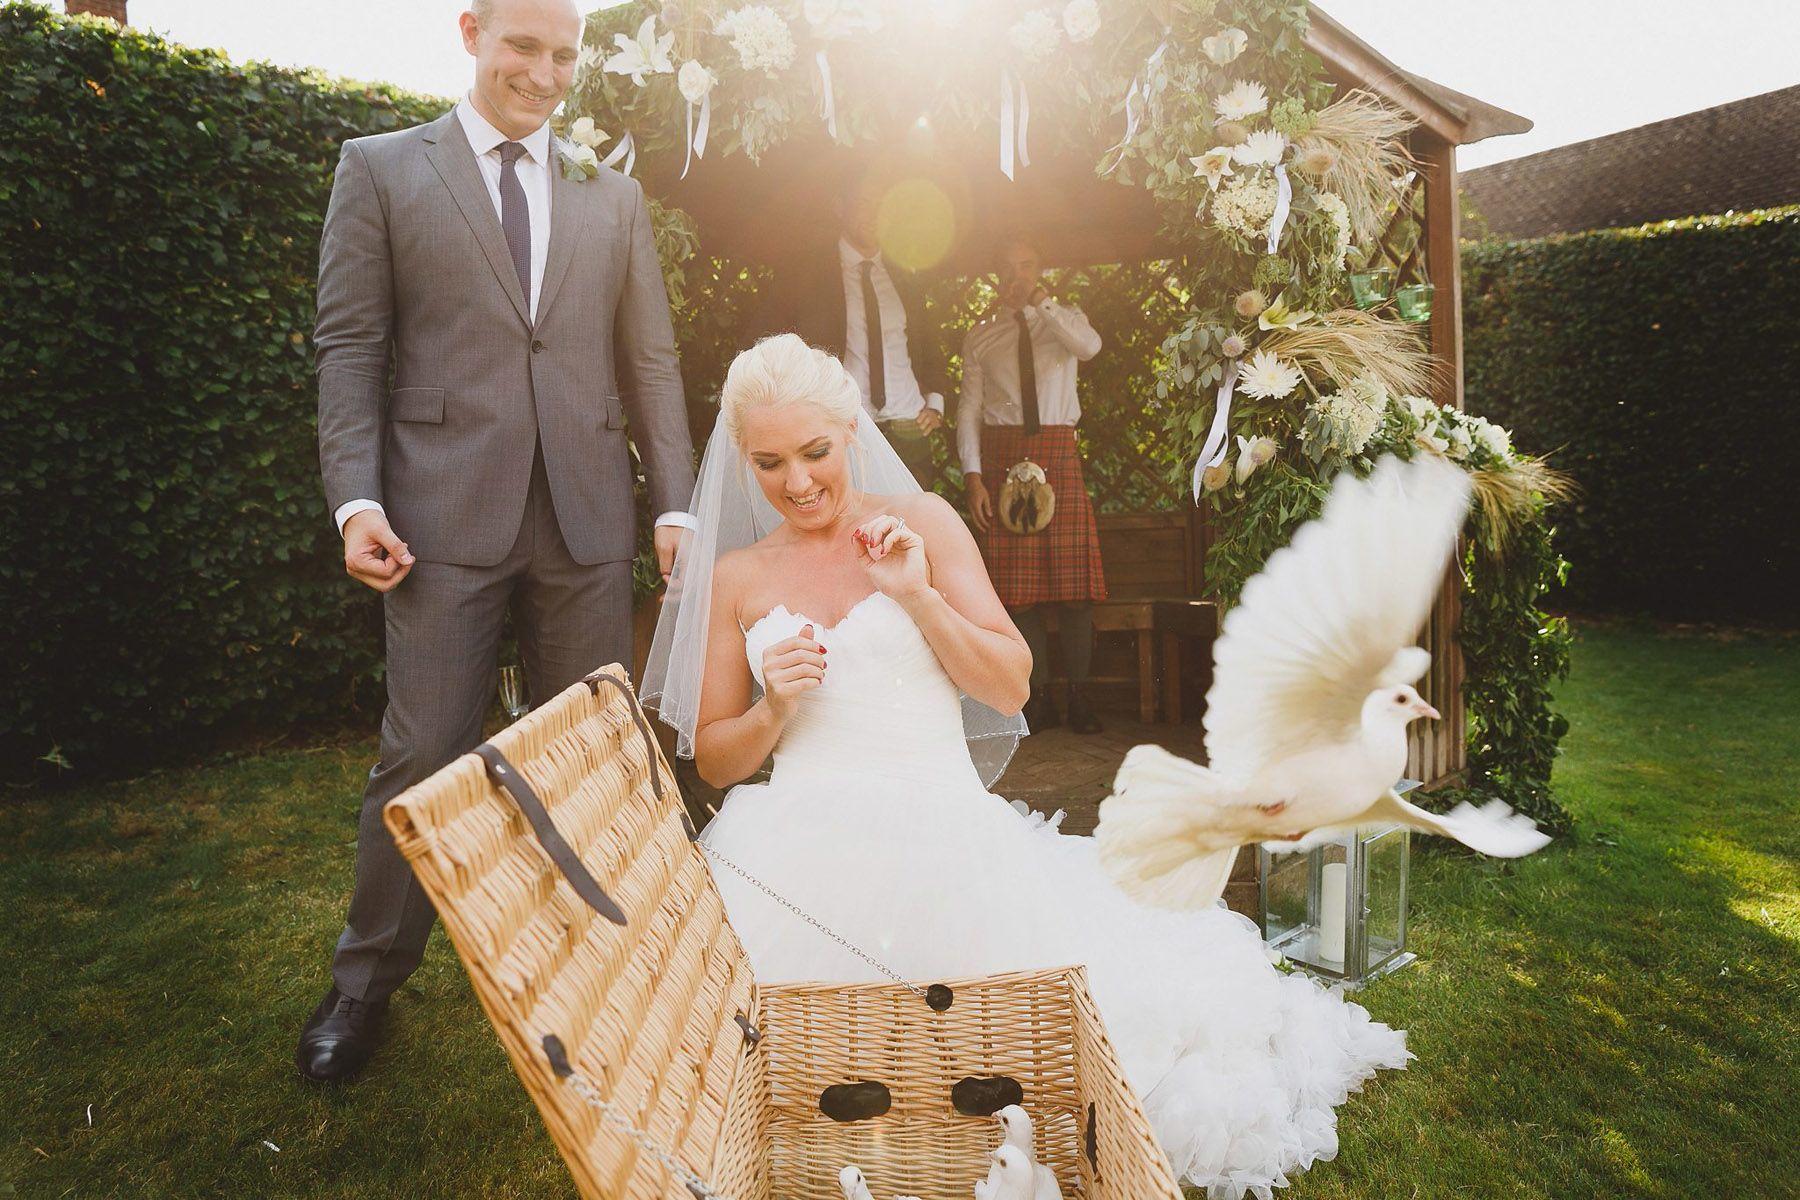 oxfordshire-wedding-photographer-046